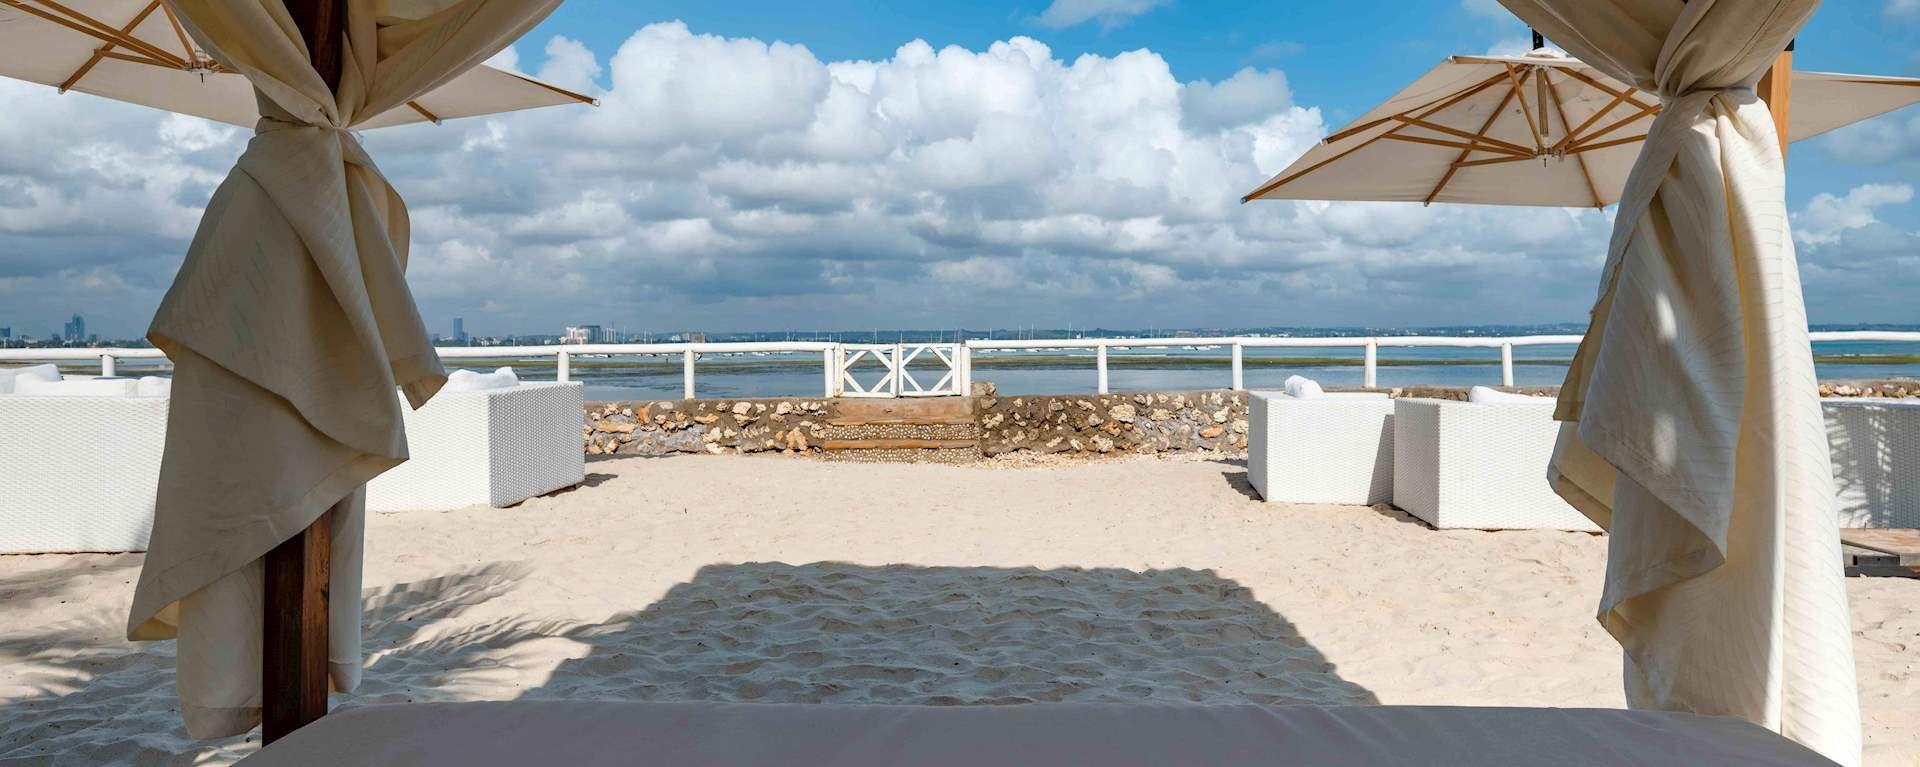 Best Western Coral Beach Hotel5